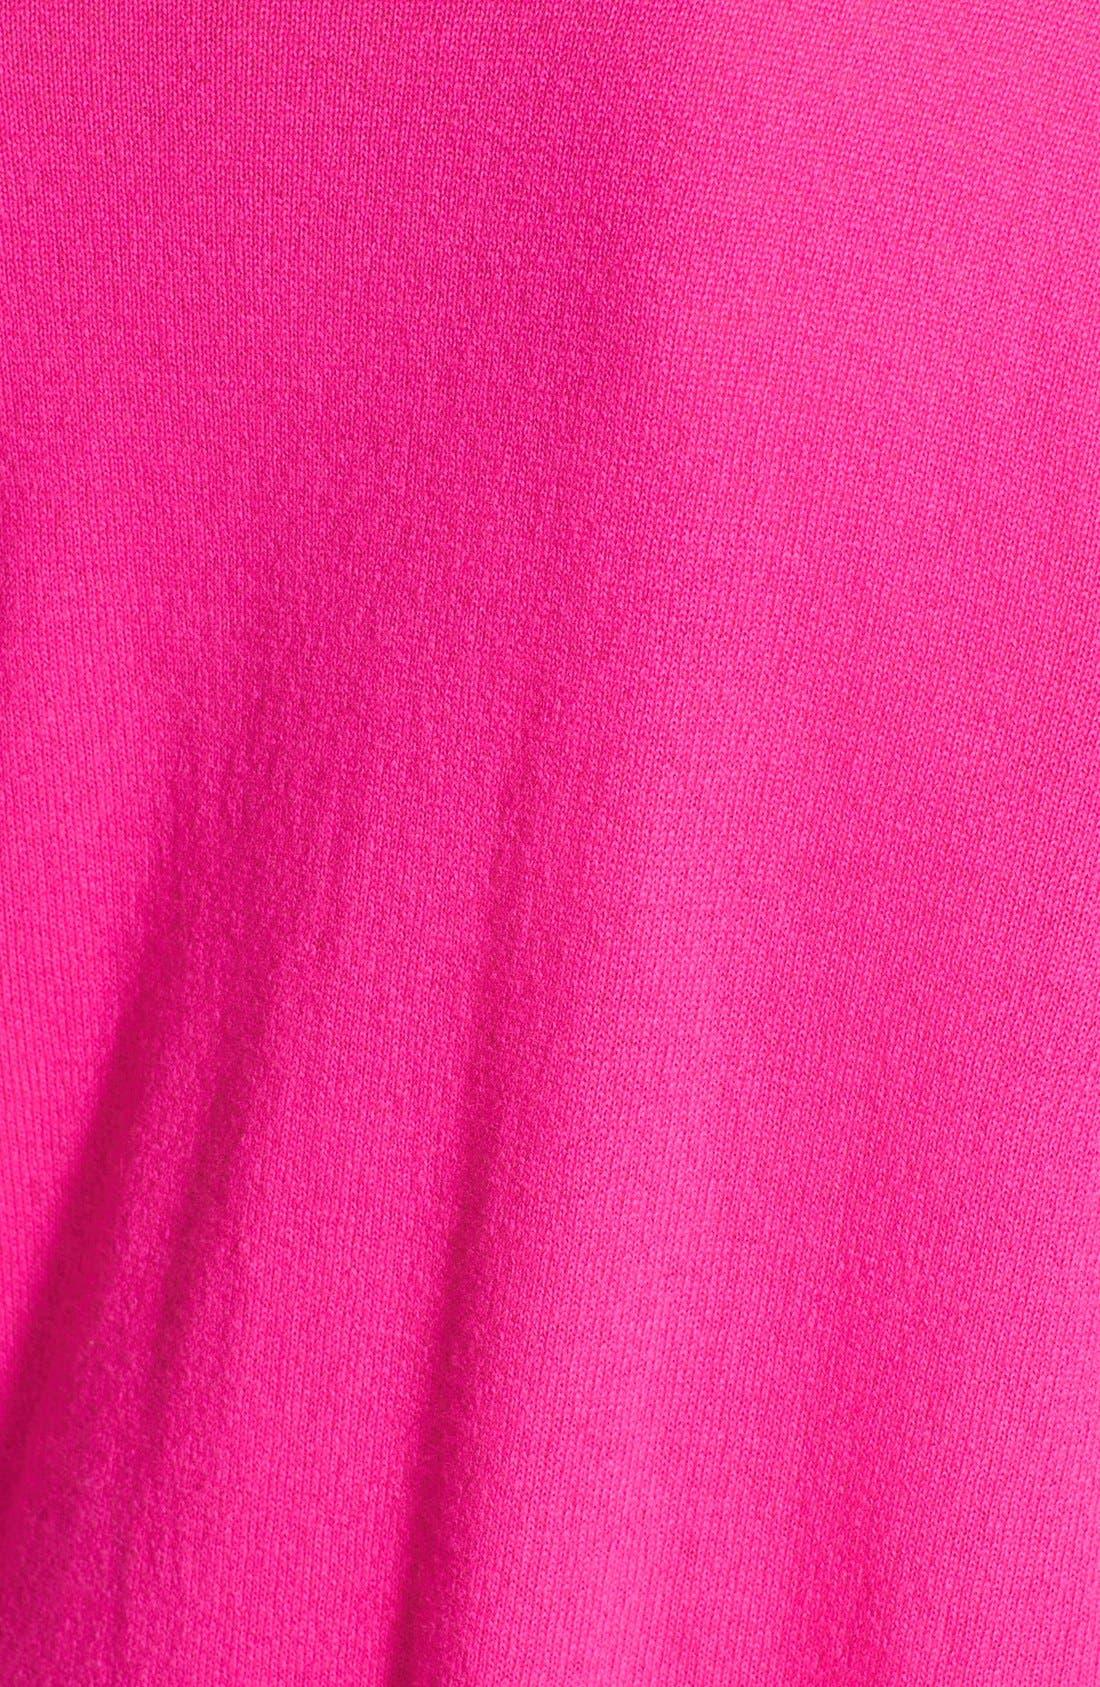 Alternate Image 3  - autumn cashmere ColorblockCashmere Boyfriend Sweater